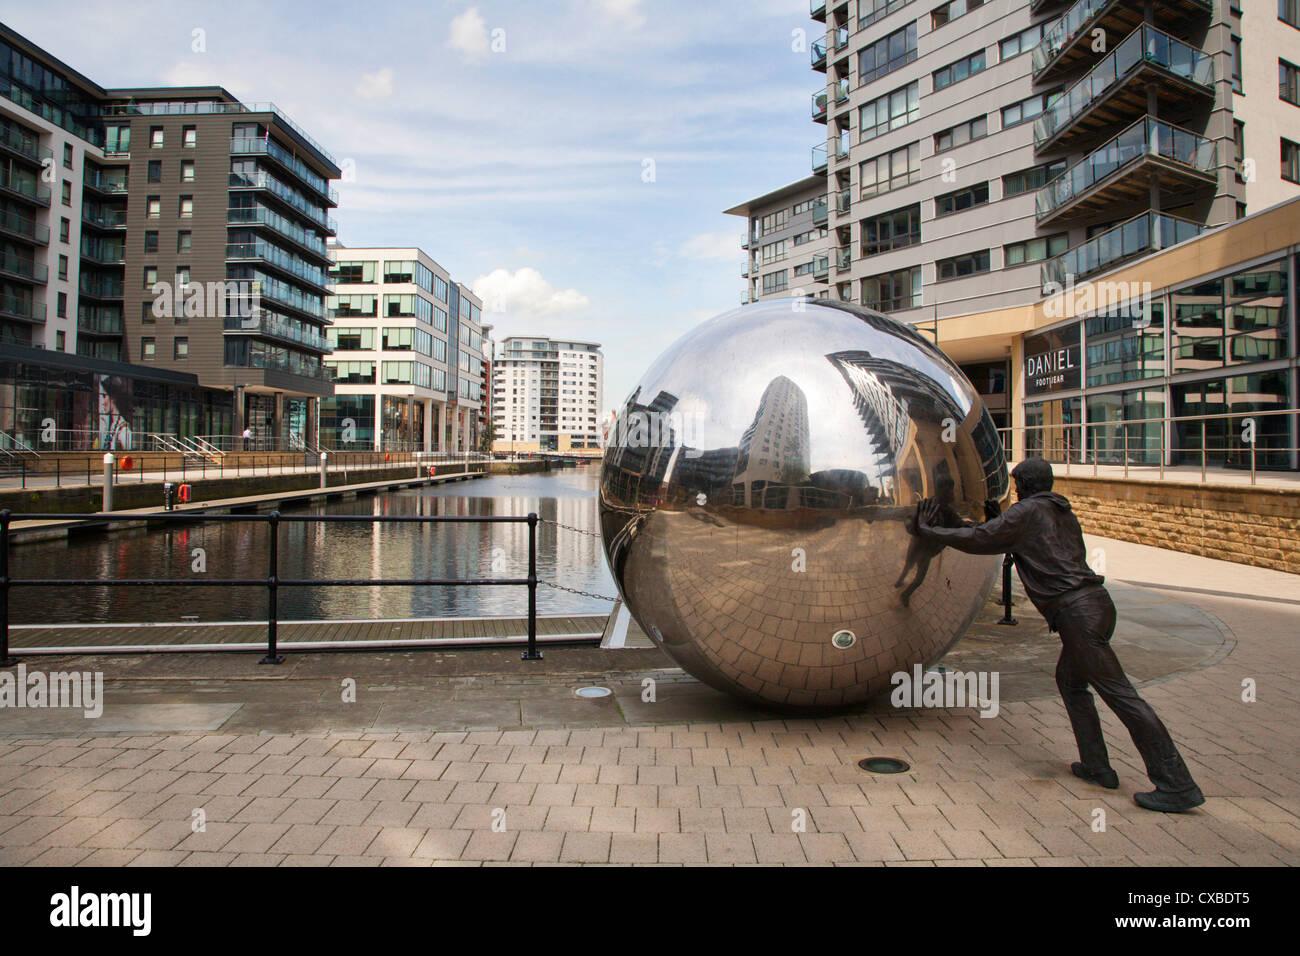 Modern sculpture at Clarence Dock, Leeds, West Yorkshire, Yorkshire, England, United Kingdom, Europe - Stock Image